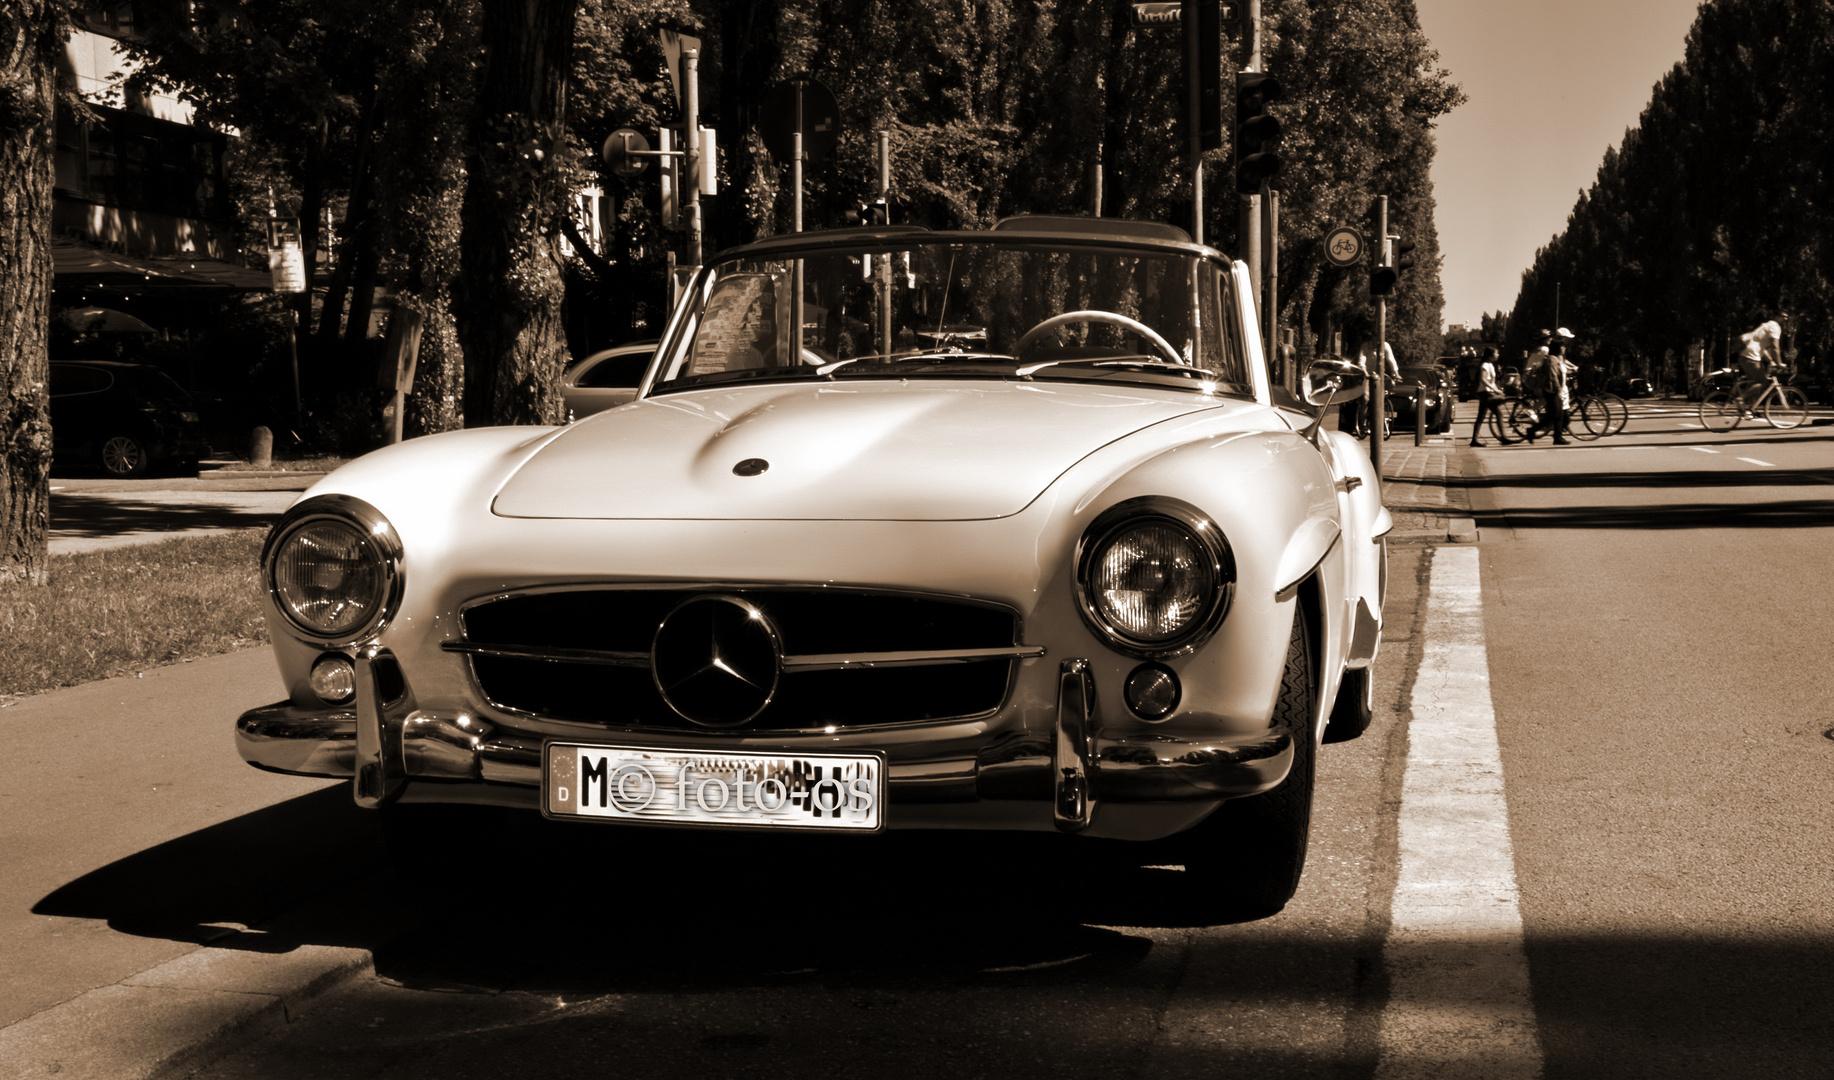 Oldtimer (Mercedes 190 SL) in München